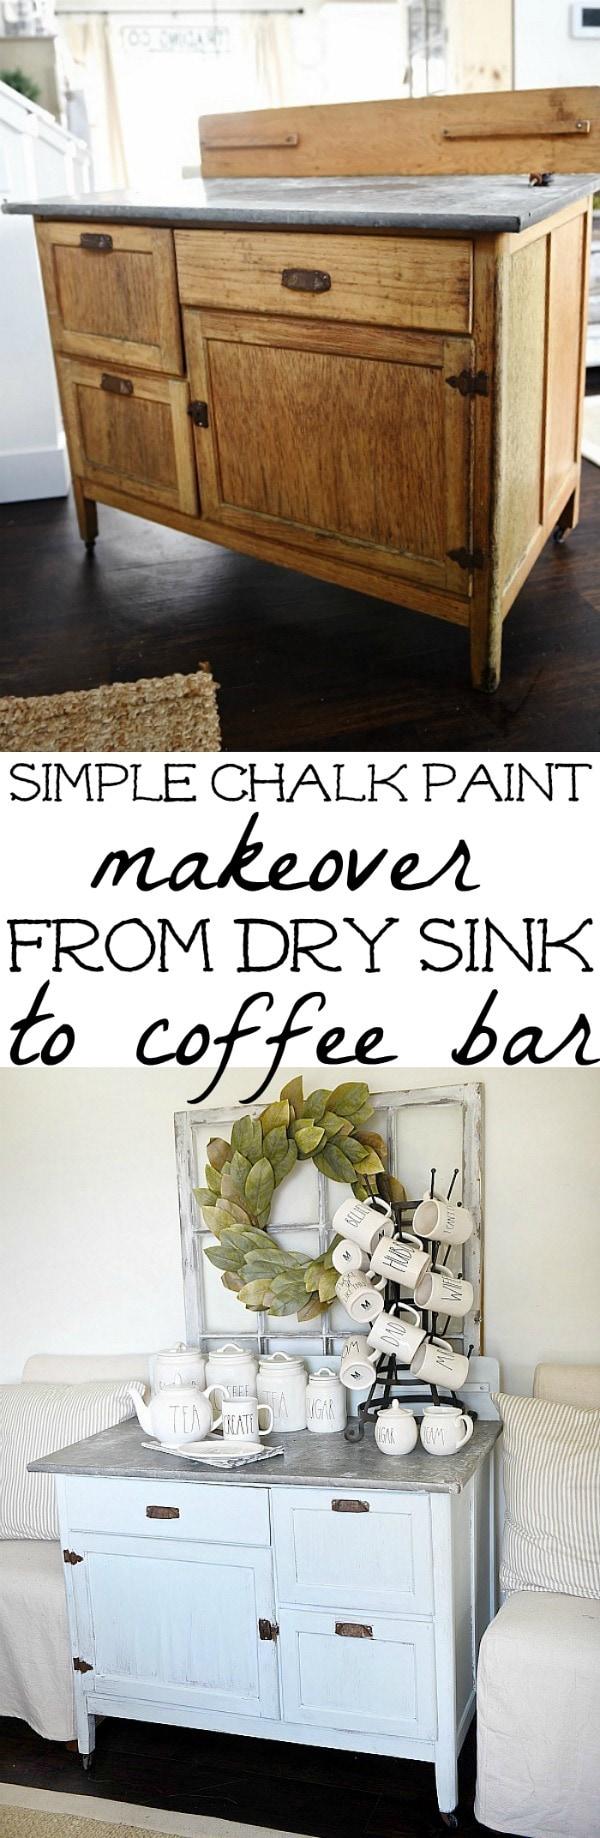 dry sink makeover diy coffee bar